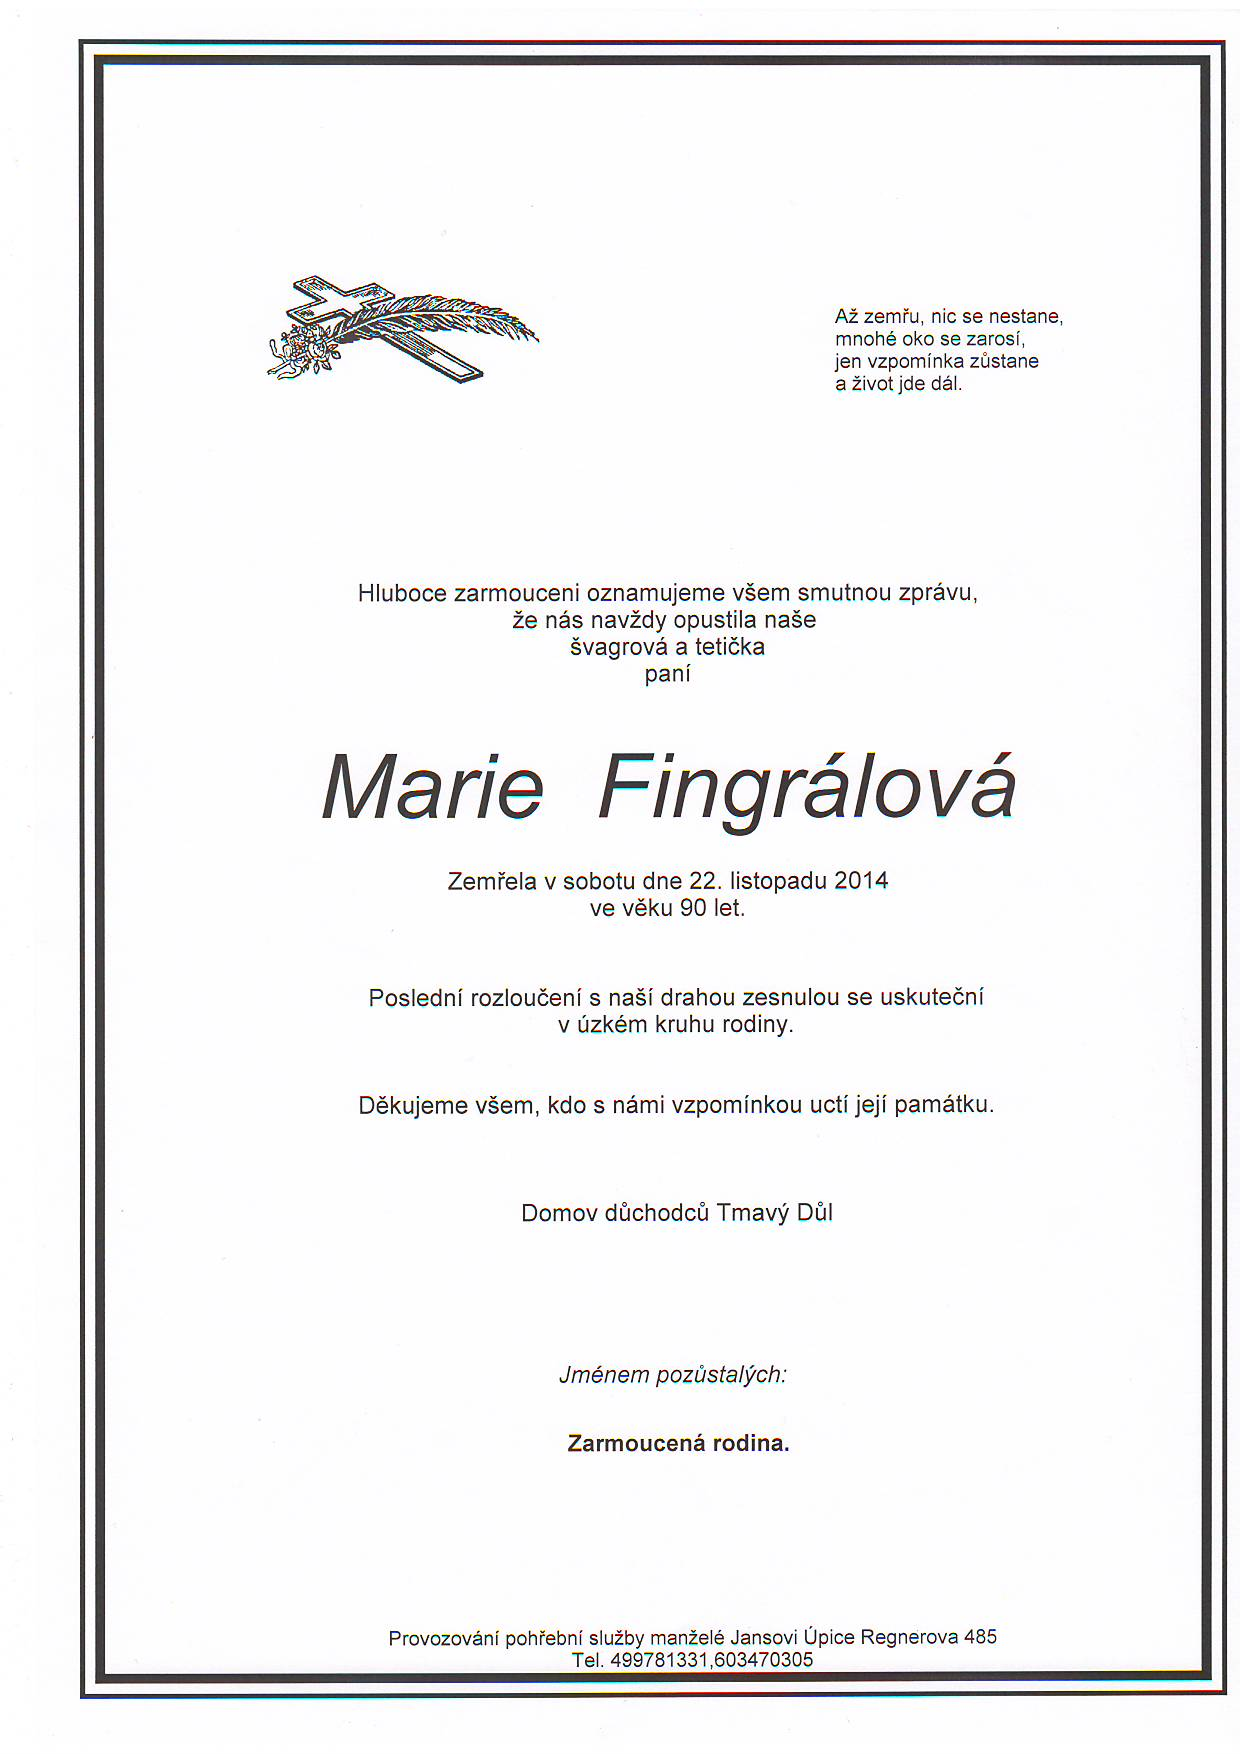 07_marie_fingralova